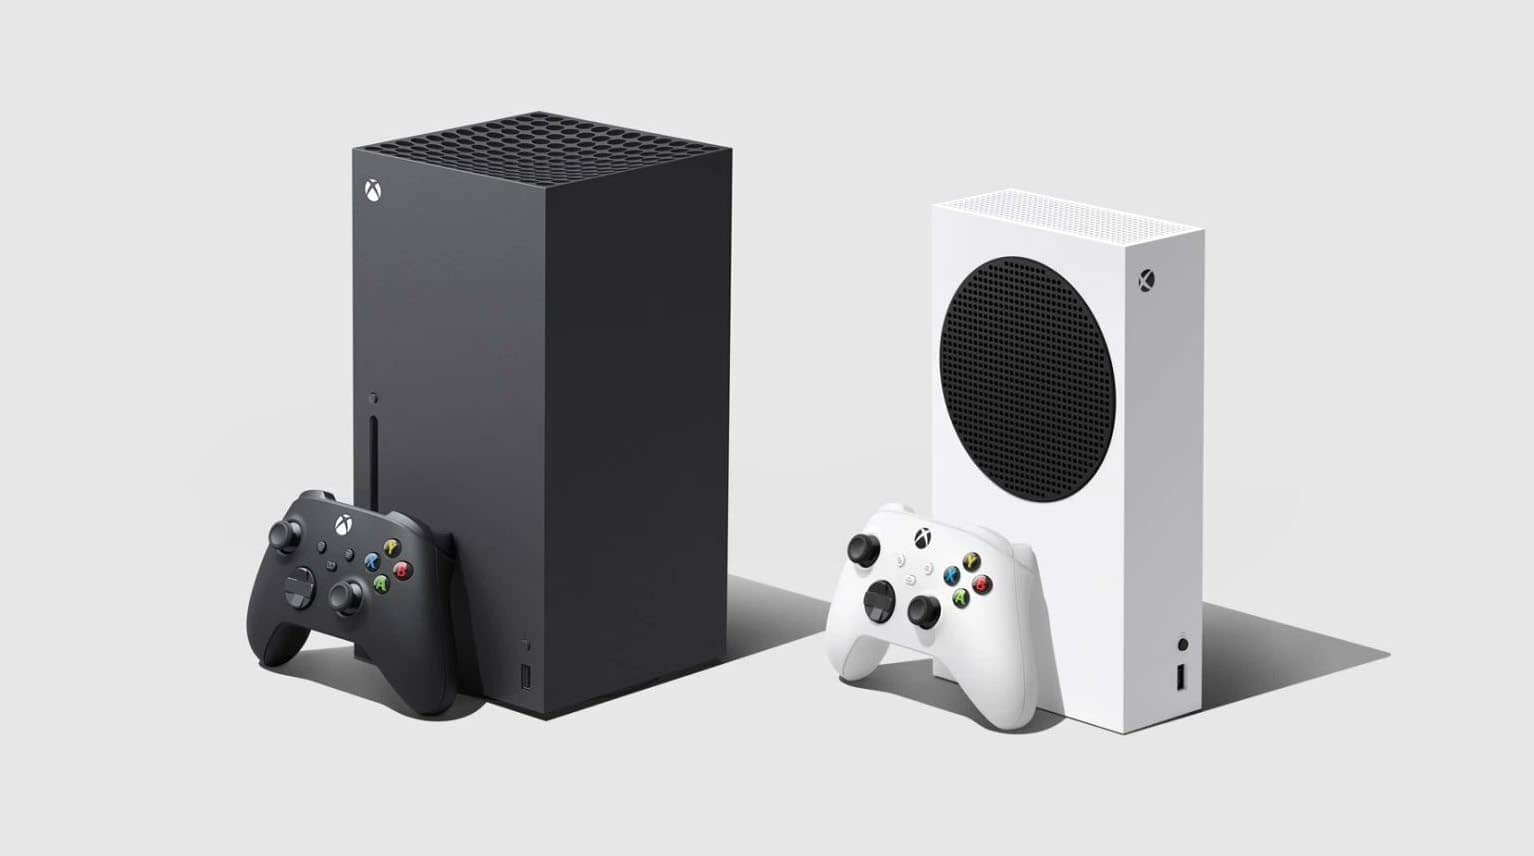 Microsoft's $499 Xbox Series X and $299 Xbox Series S launch November 10